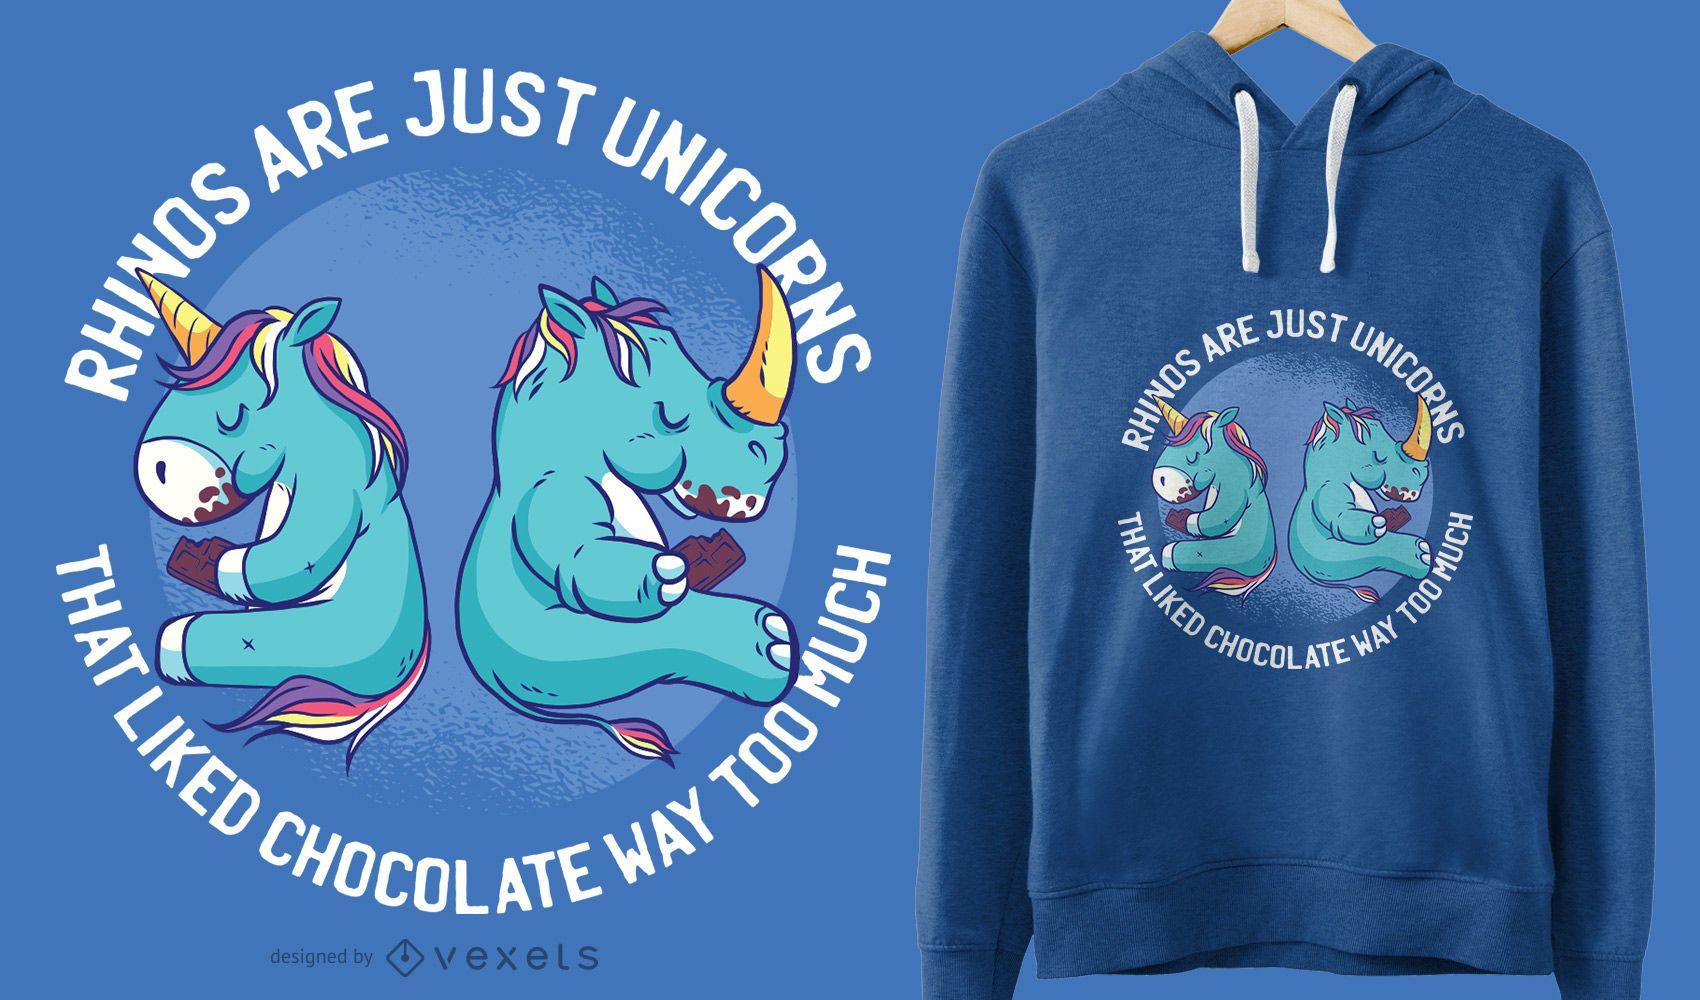 Design gráfico de camisetas Unicorn and Rhino